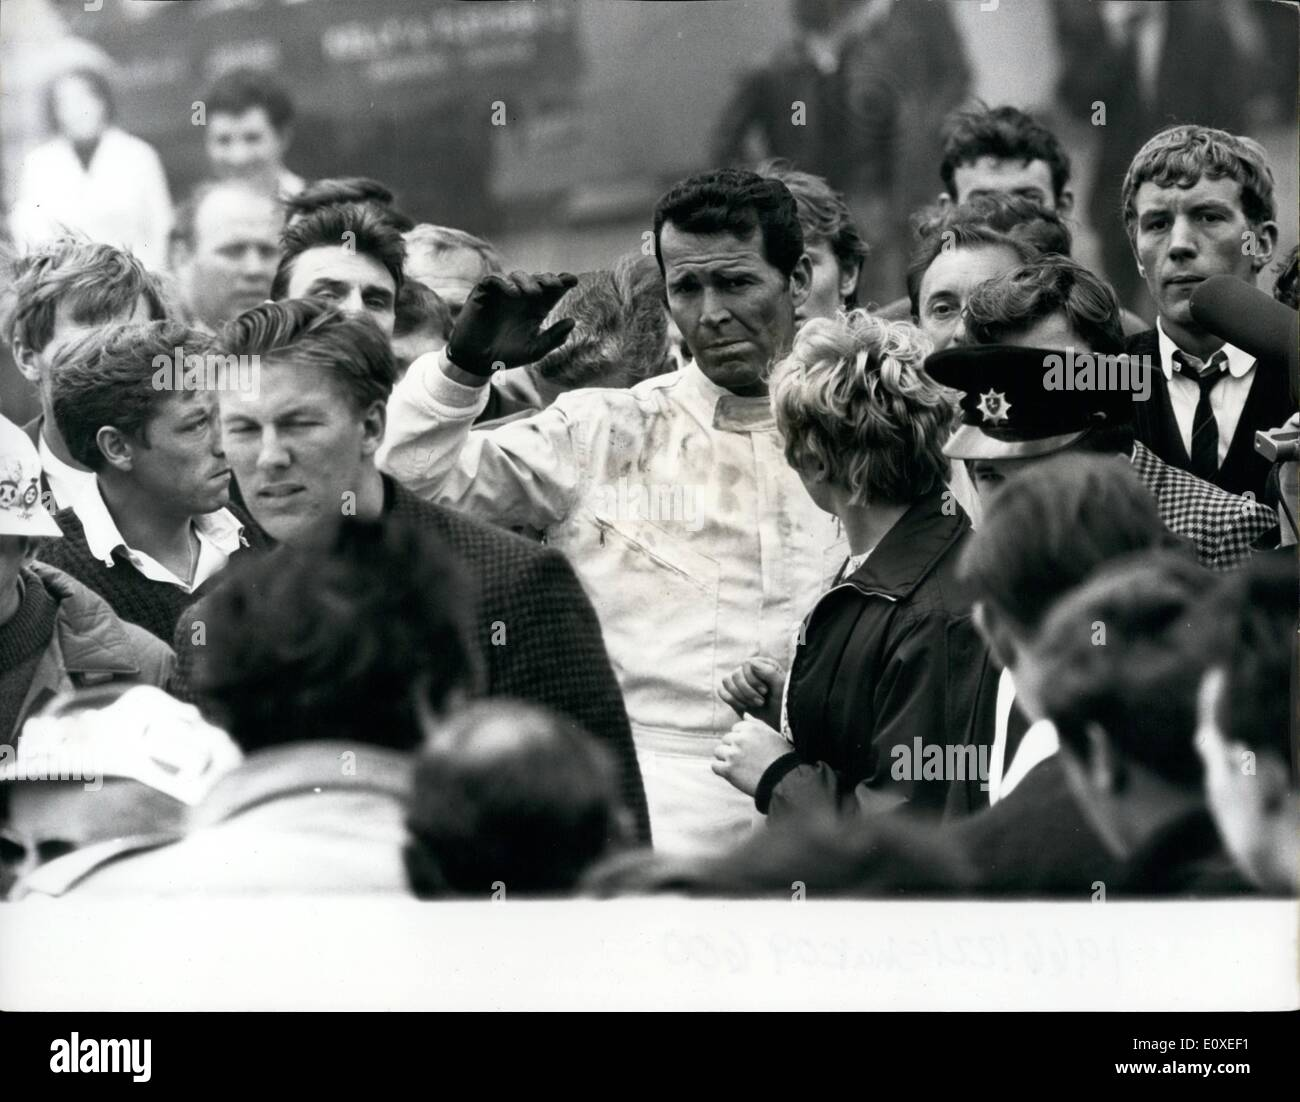 What Movie Was Filmed At Westbury Gardens: Grand Prix 1966 Stock Photos & Grand Prix 1966 Stock